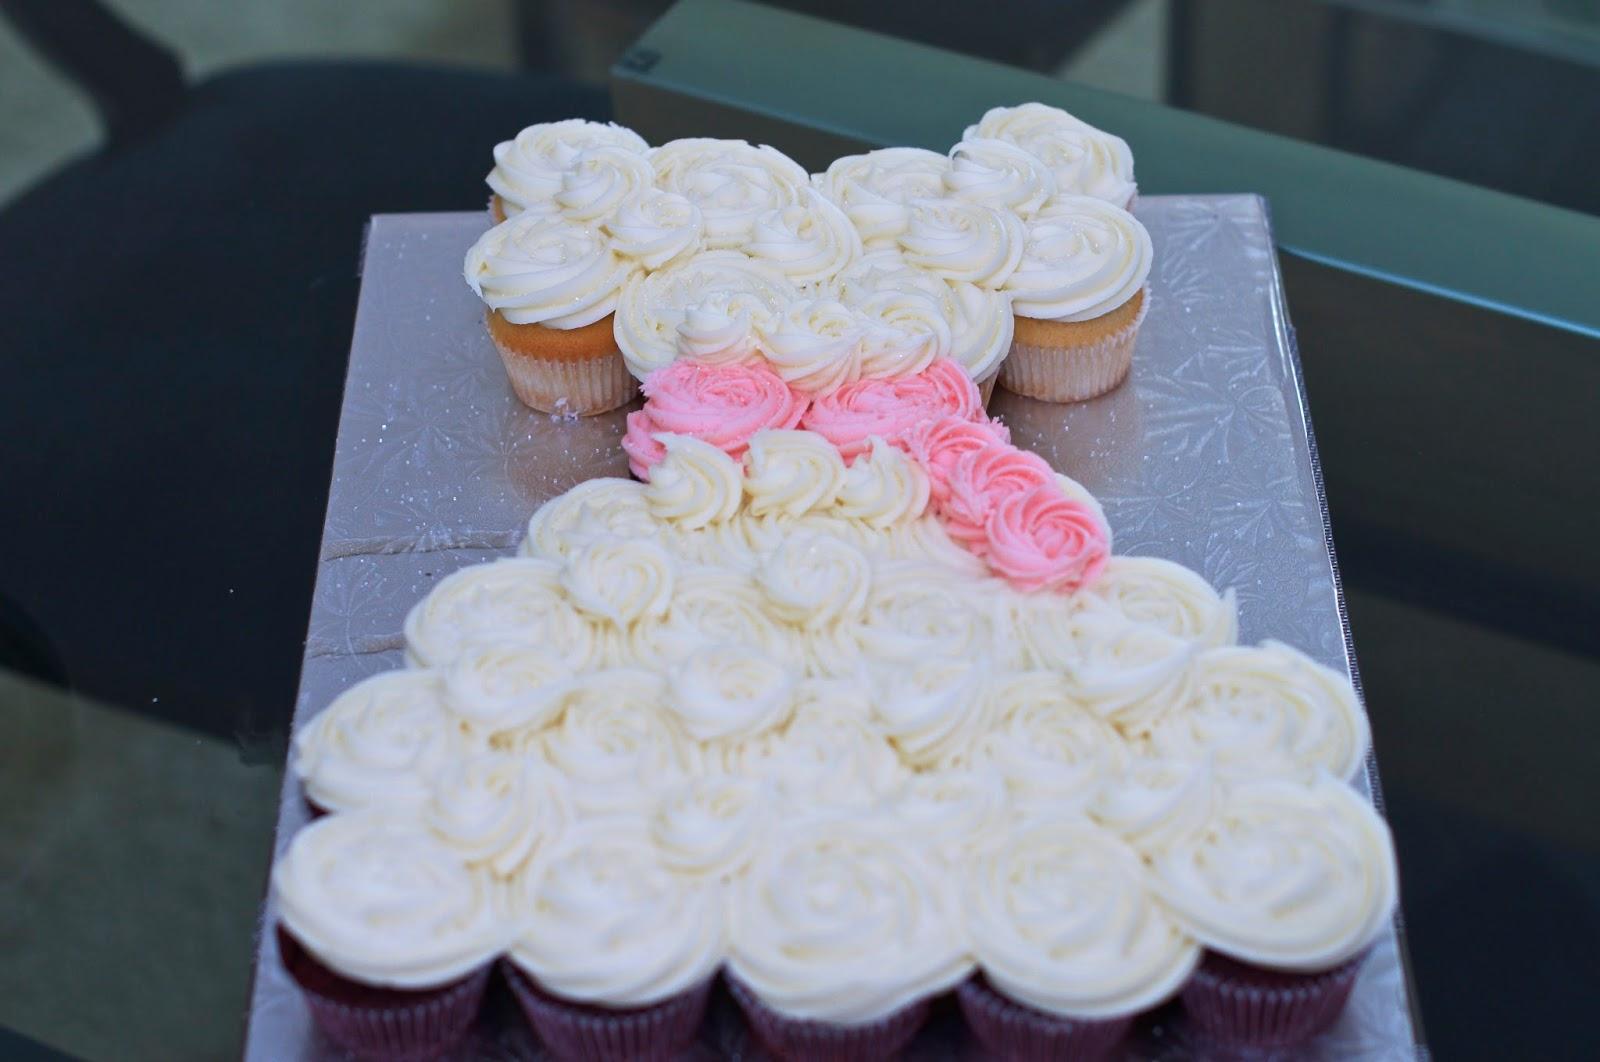 Wedding Dress Cupcake Cake 12 Spectacular We wanted to share